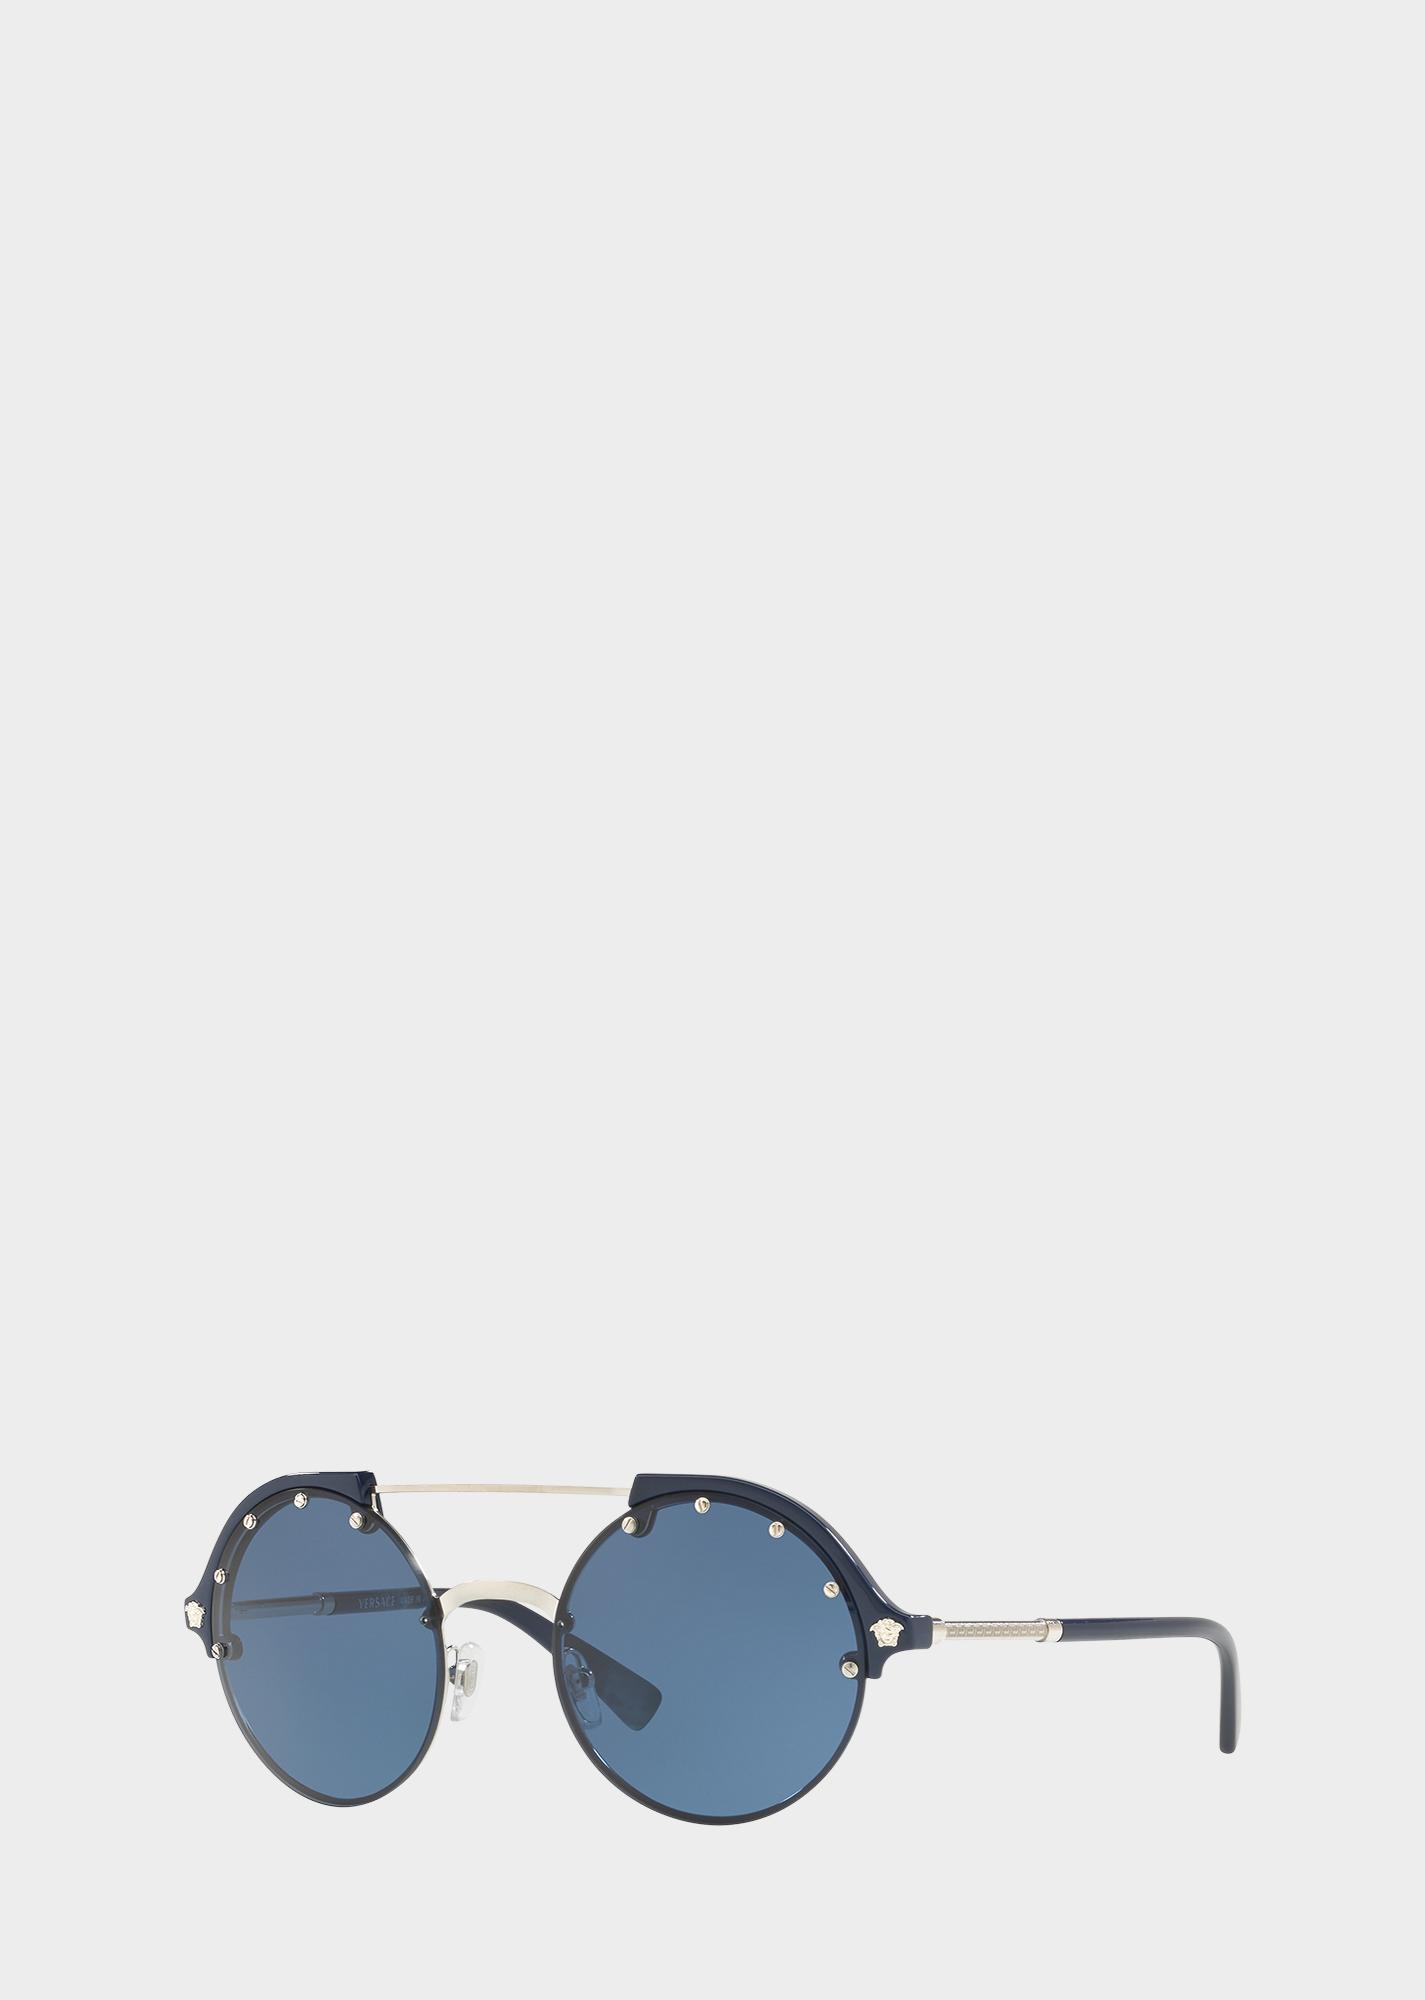 726064dc6226 Versace Blue  Frenergy Round Sunglasses for Women